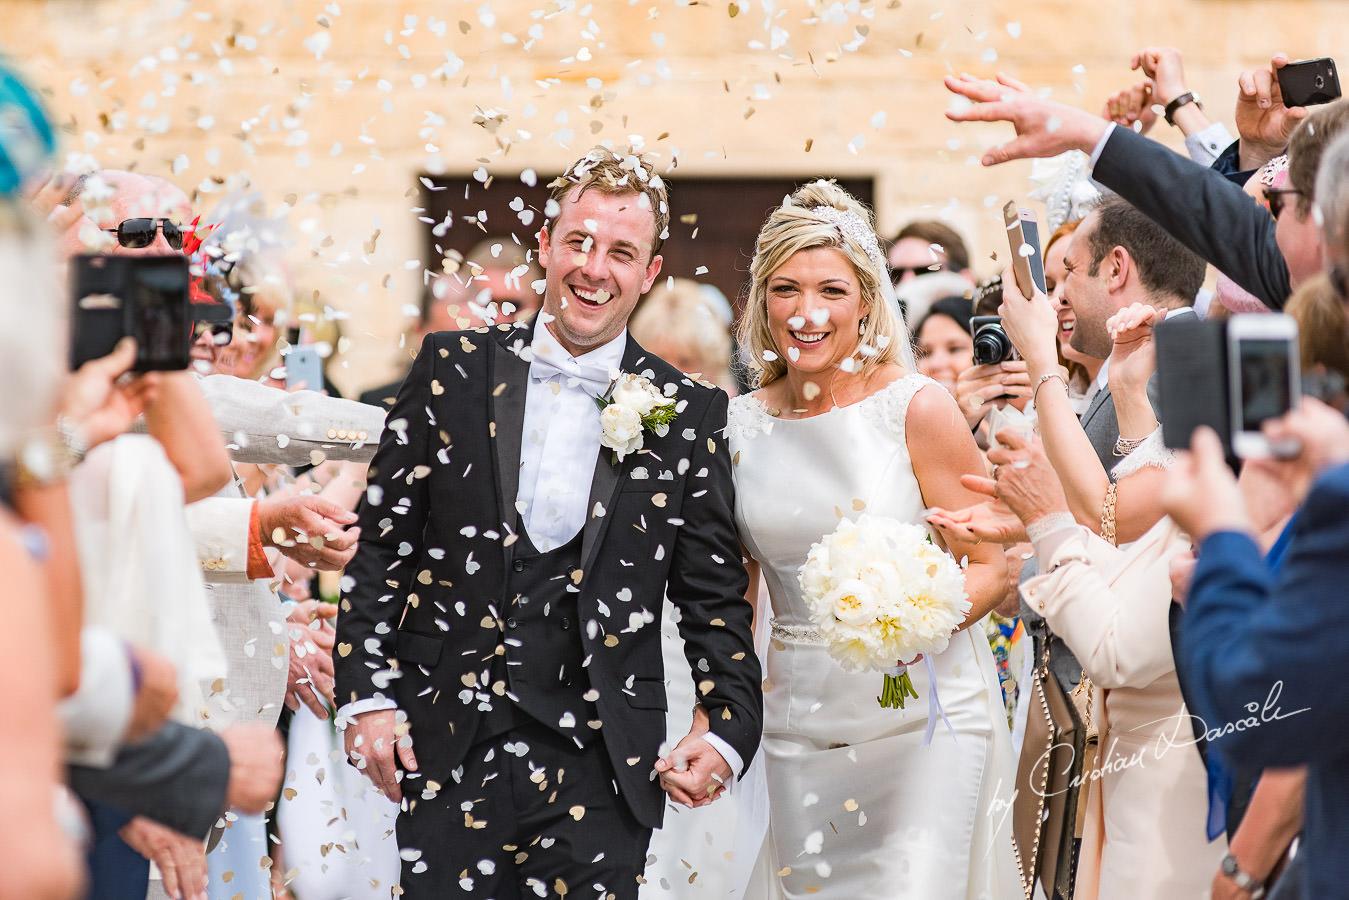 Amazing Wedding Photography at the Elysium Hotel by Cyprus Wedding Photographer Cristian Dascalu.